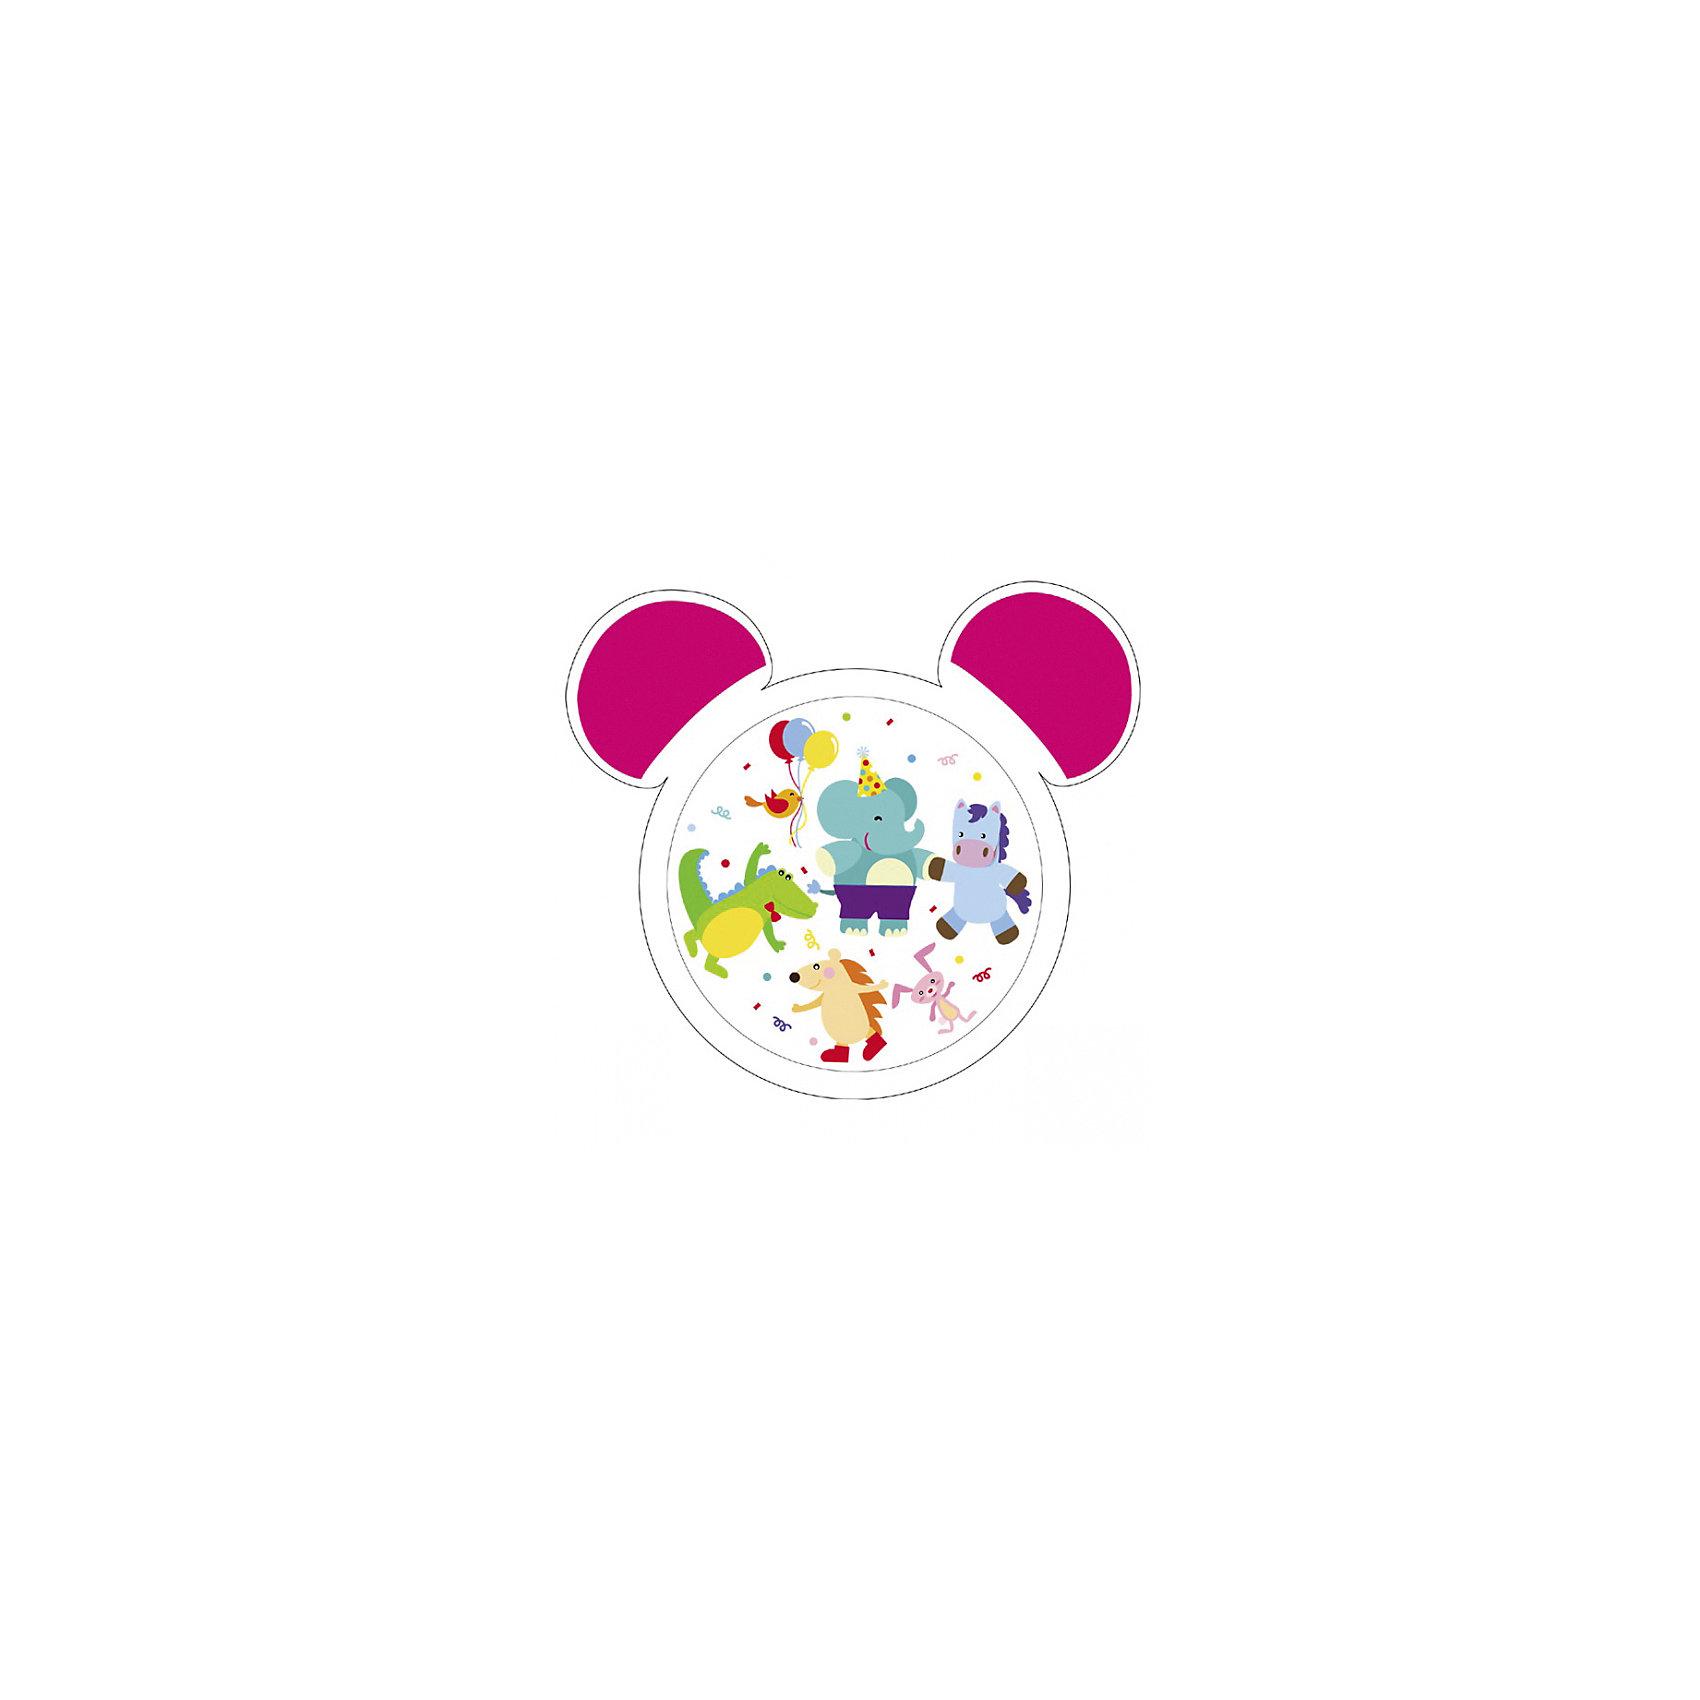 Тарелка с ушами, 270 мл., Canpol Babies, белый/розовый